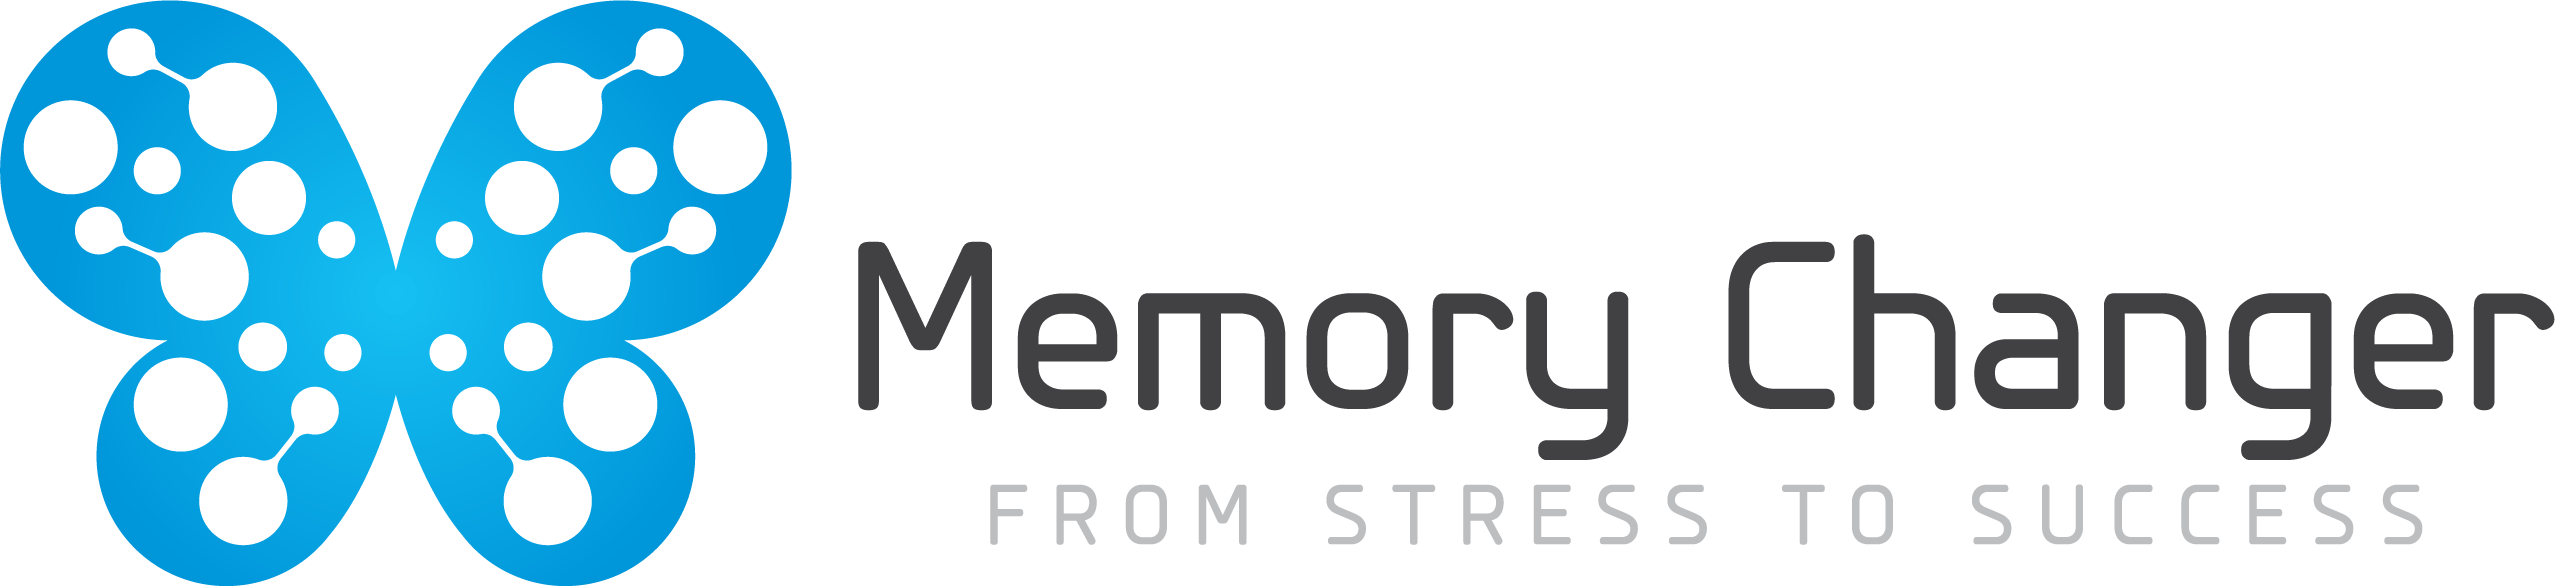 Memories clipart memory problem. Home changer